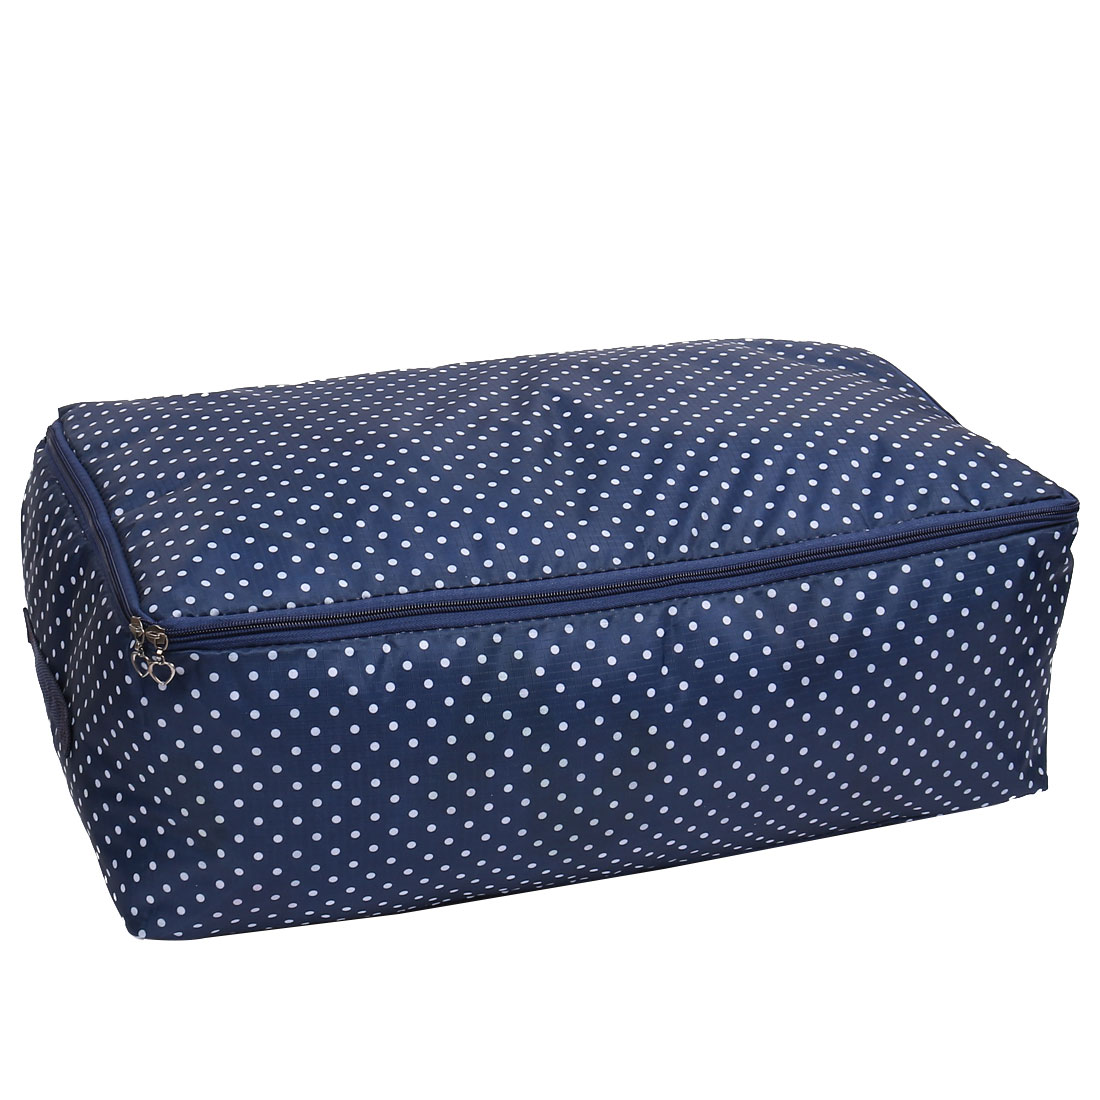 Dots Printed Clothes Quilt Sorting Box Storage Bag Organizer Navy Blue